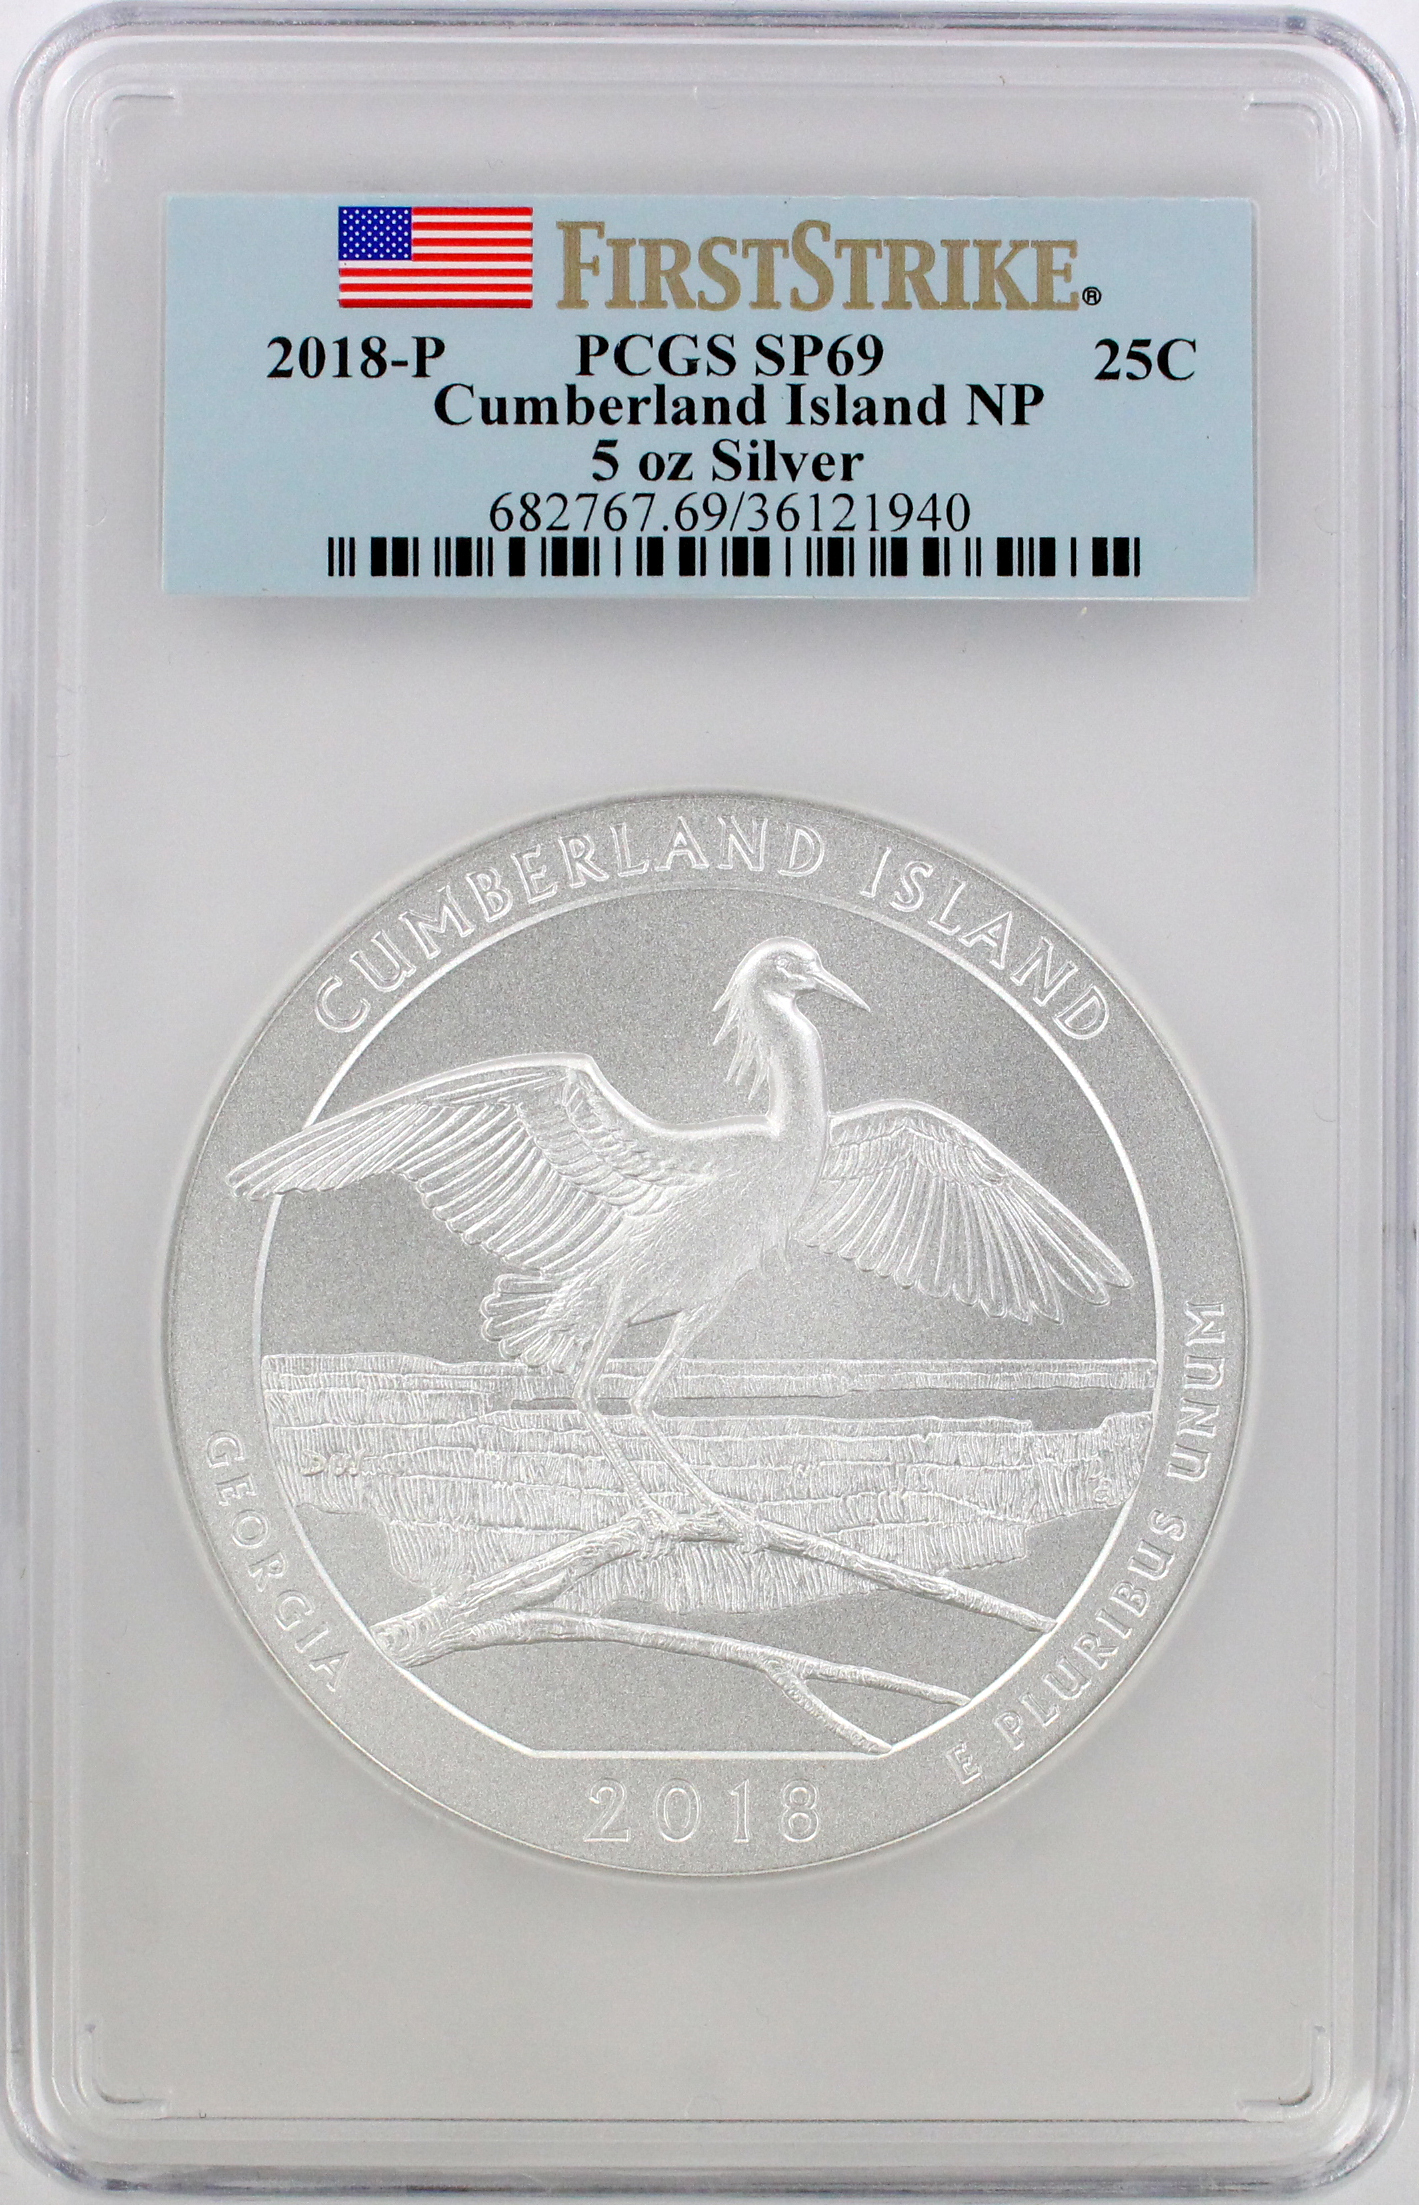 2018-P 5 oz Silver Cumberland Island National Park America the Beautiful Quarter, SP69, First Strike, PCGS